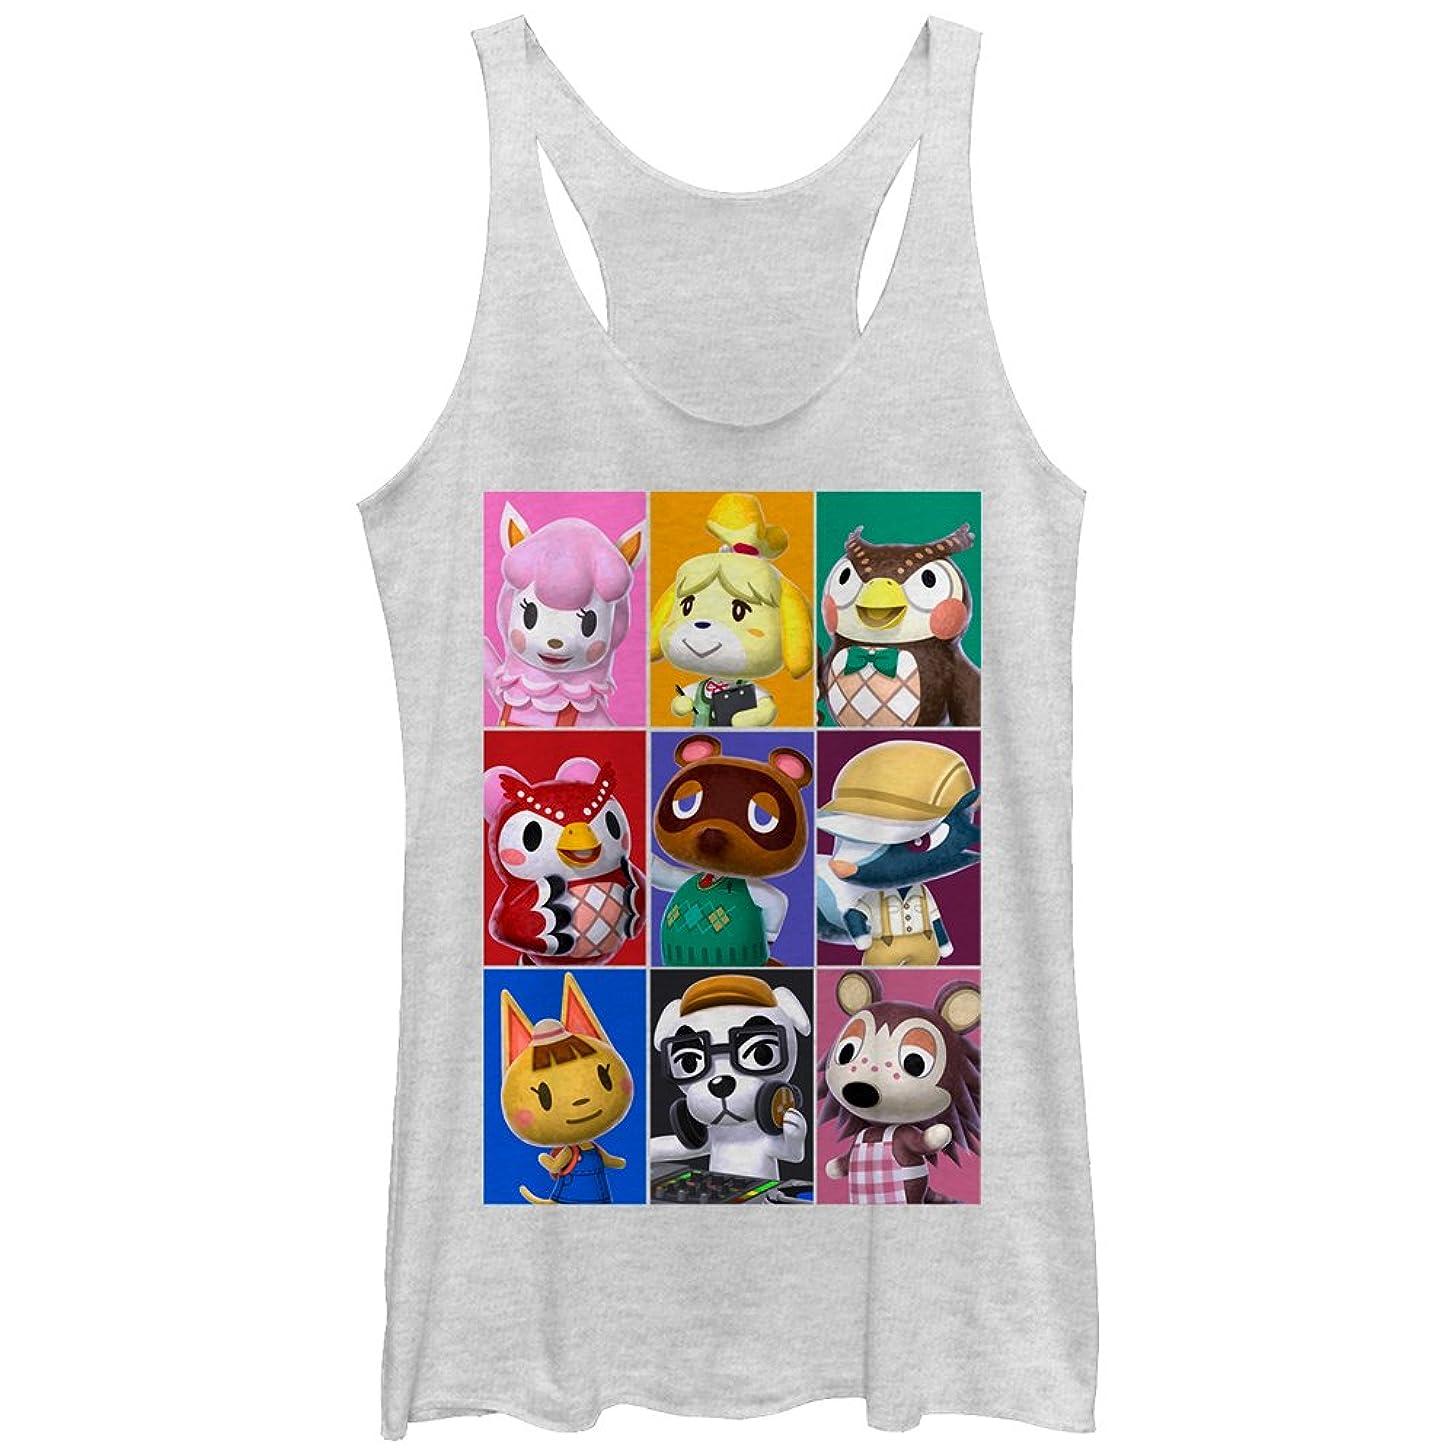 Nintendo Women's Animal Crossing Characters Racerback Tank Top